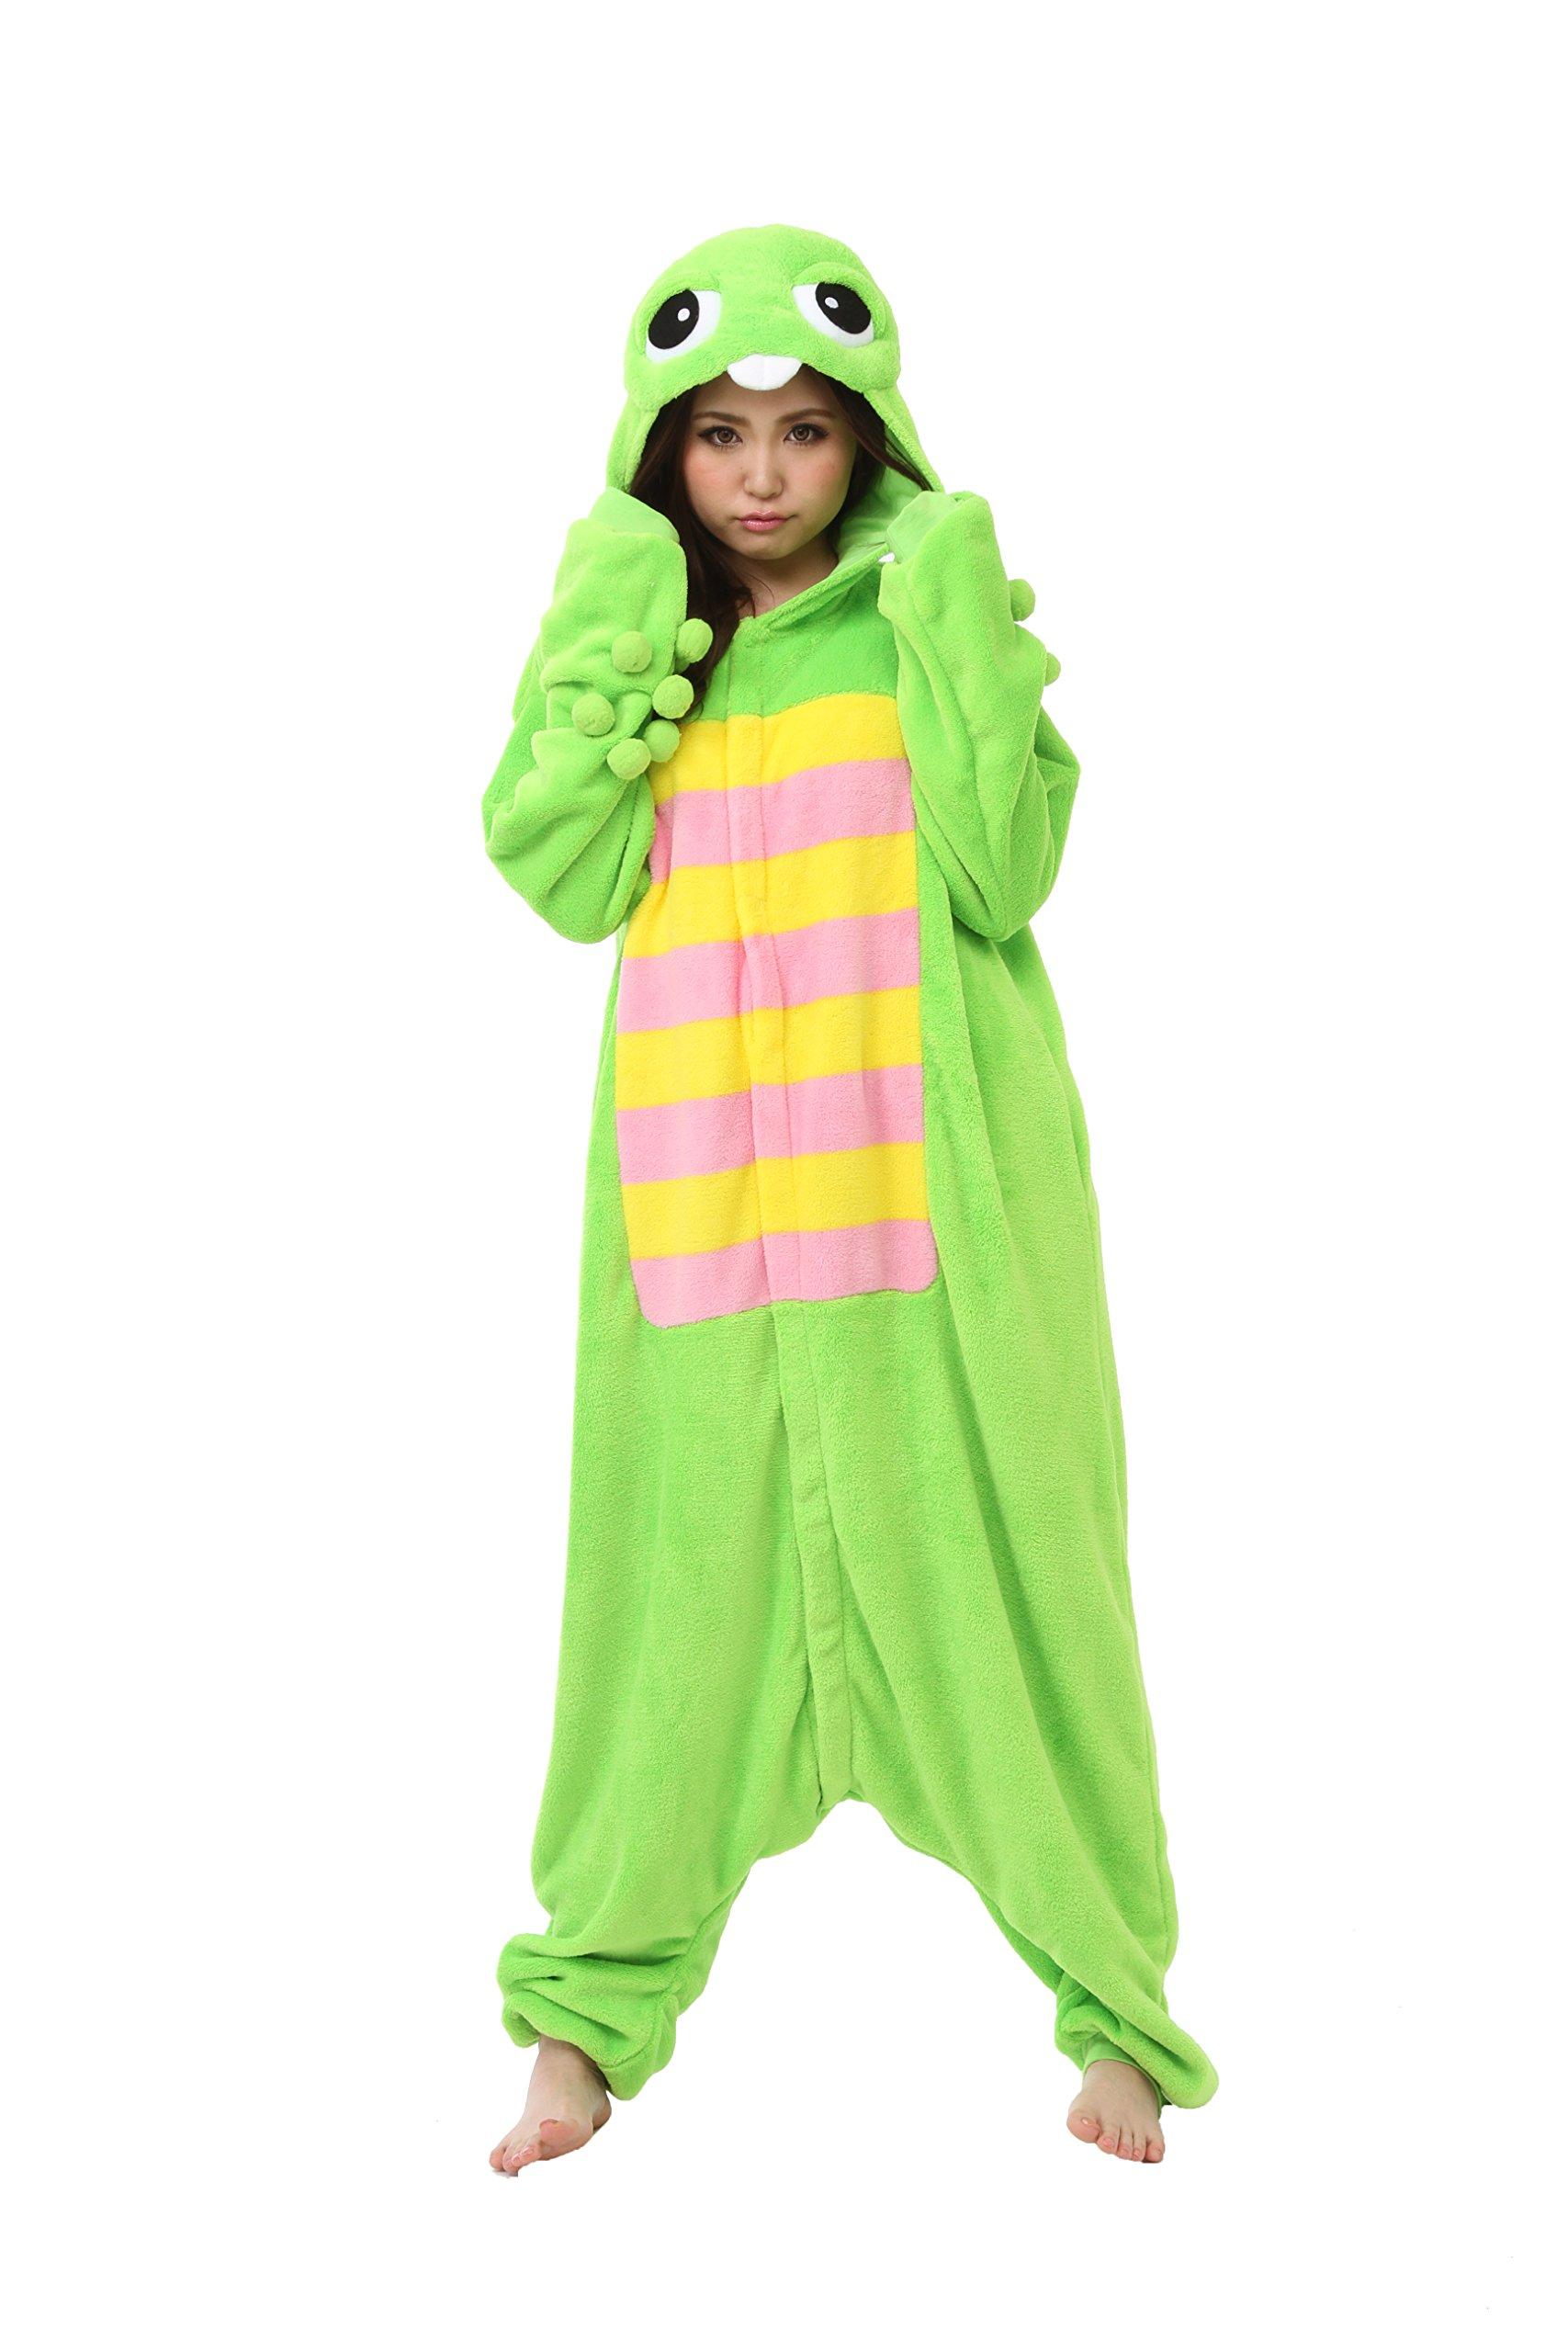 Gachapin Kigurumi - Adults Costume